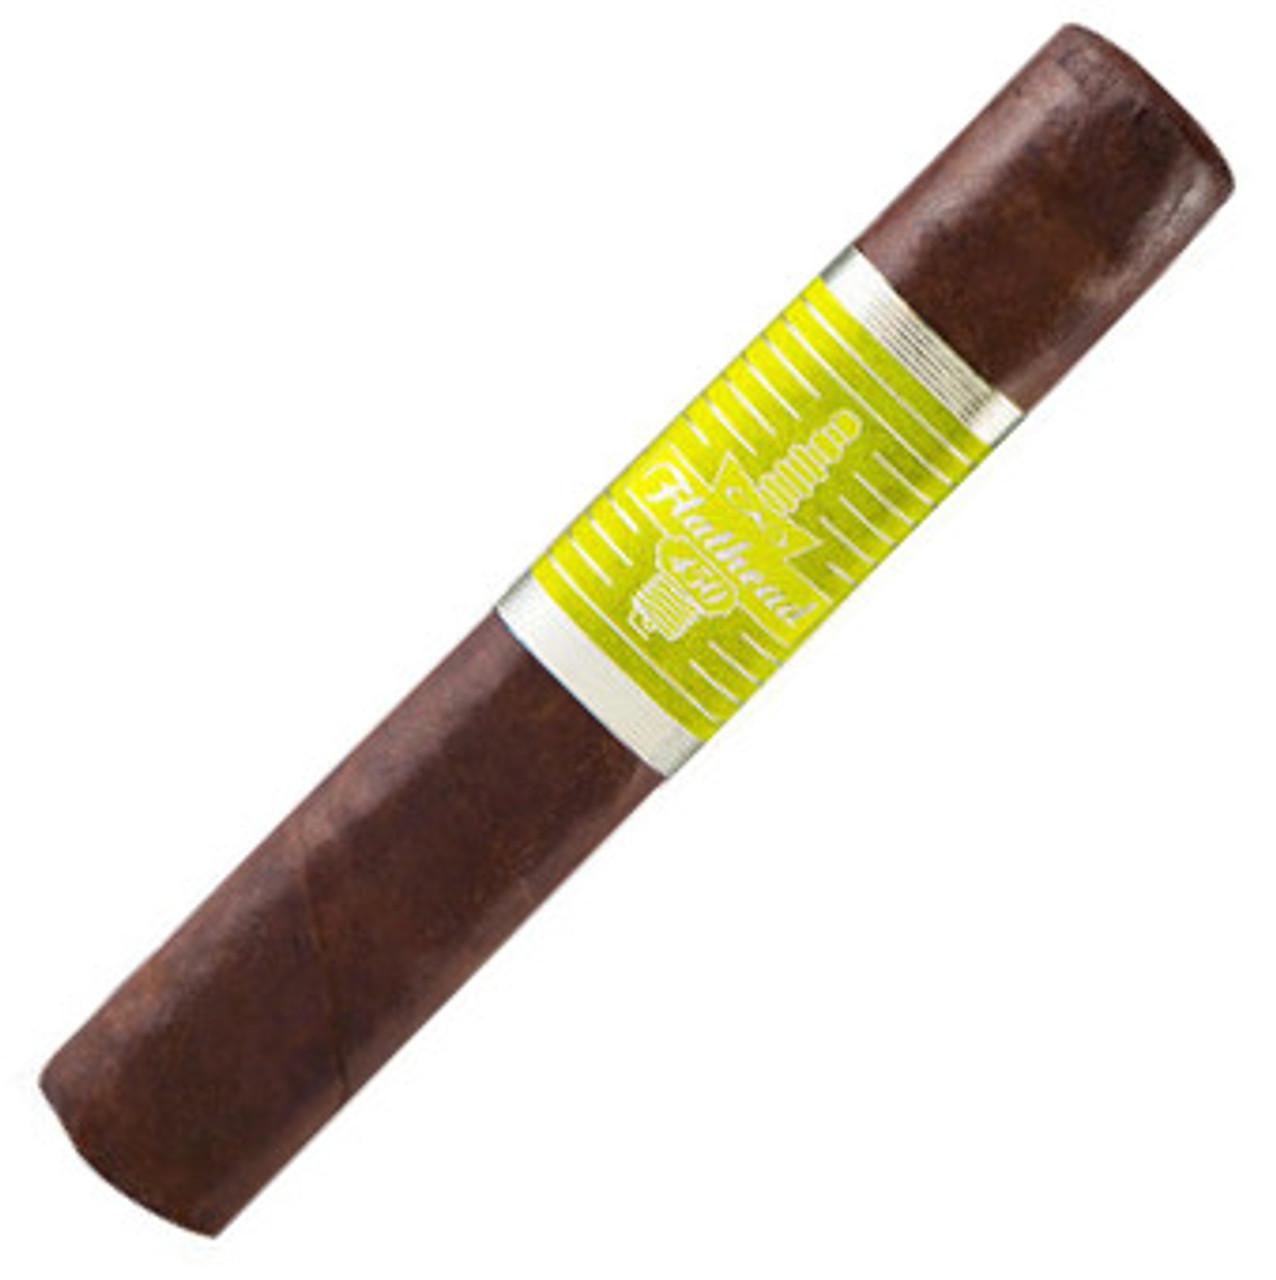 CAO Flathead V450 Spark Plug Cigars - 4 1/2 x 50 (Box of 20)